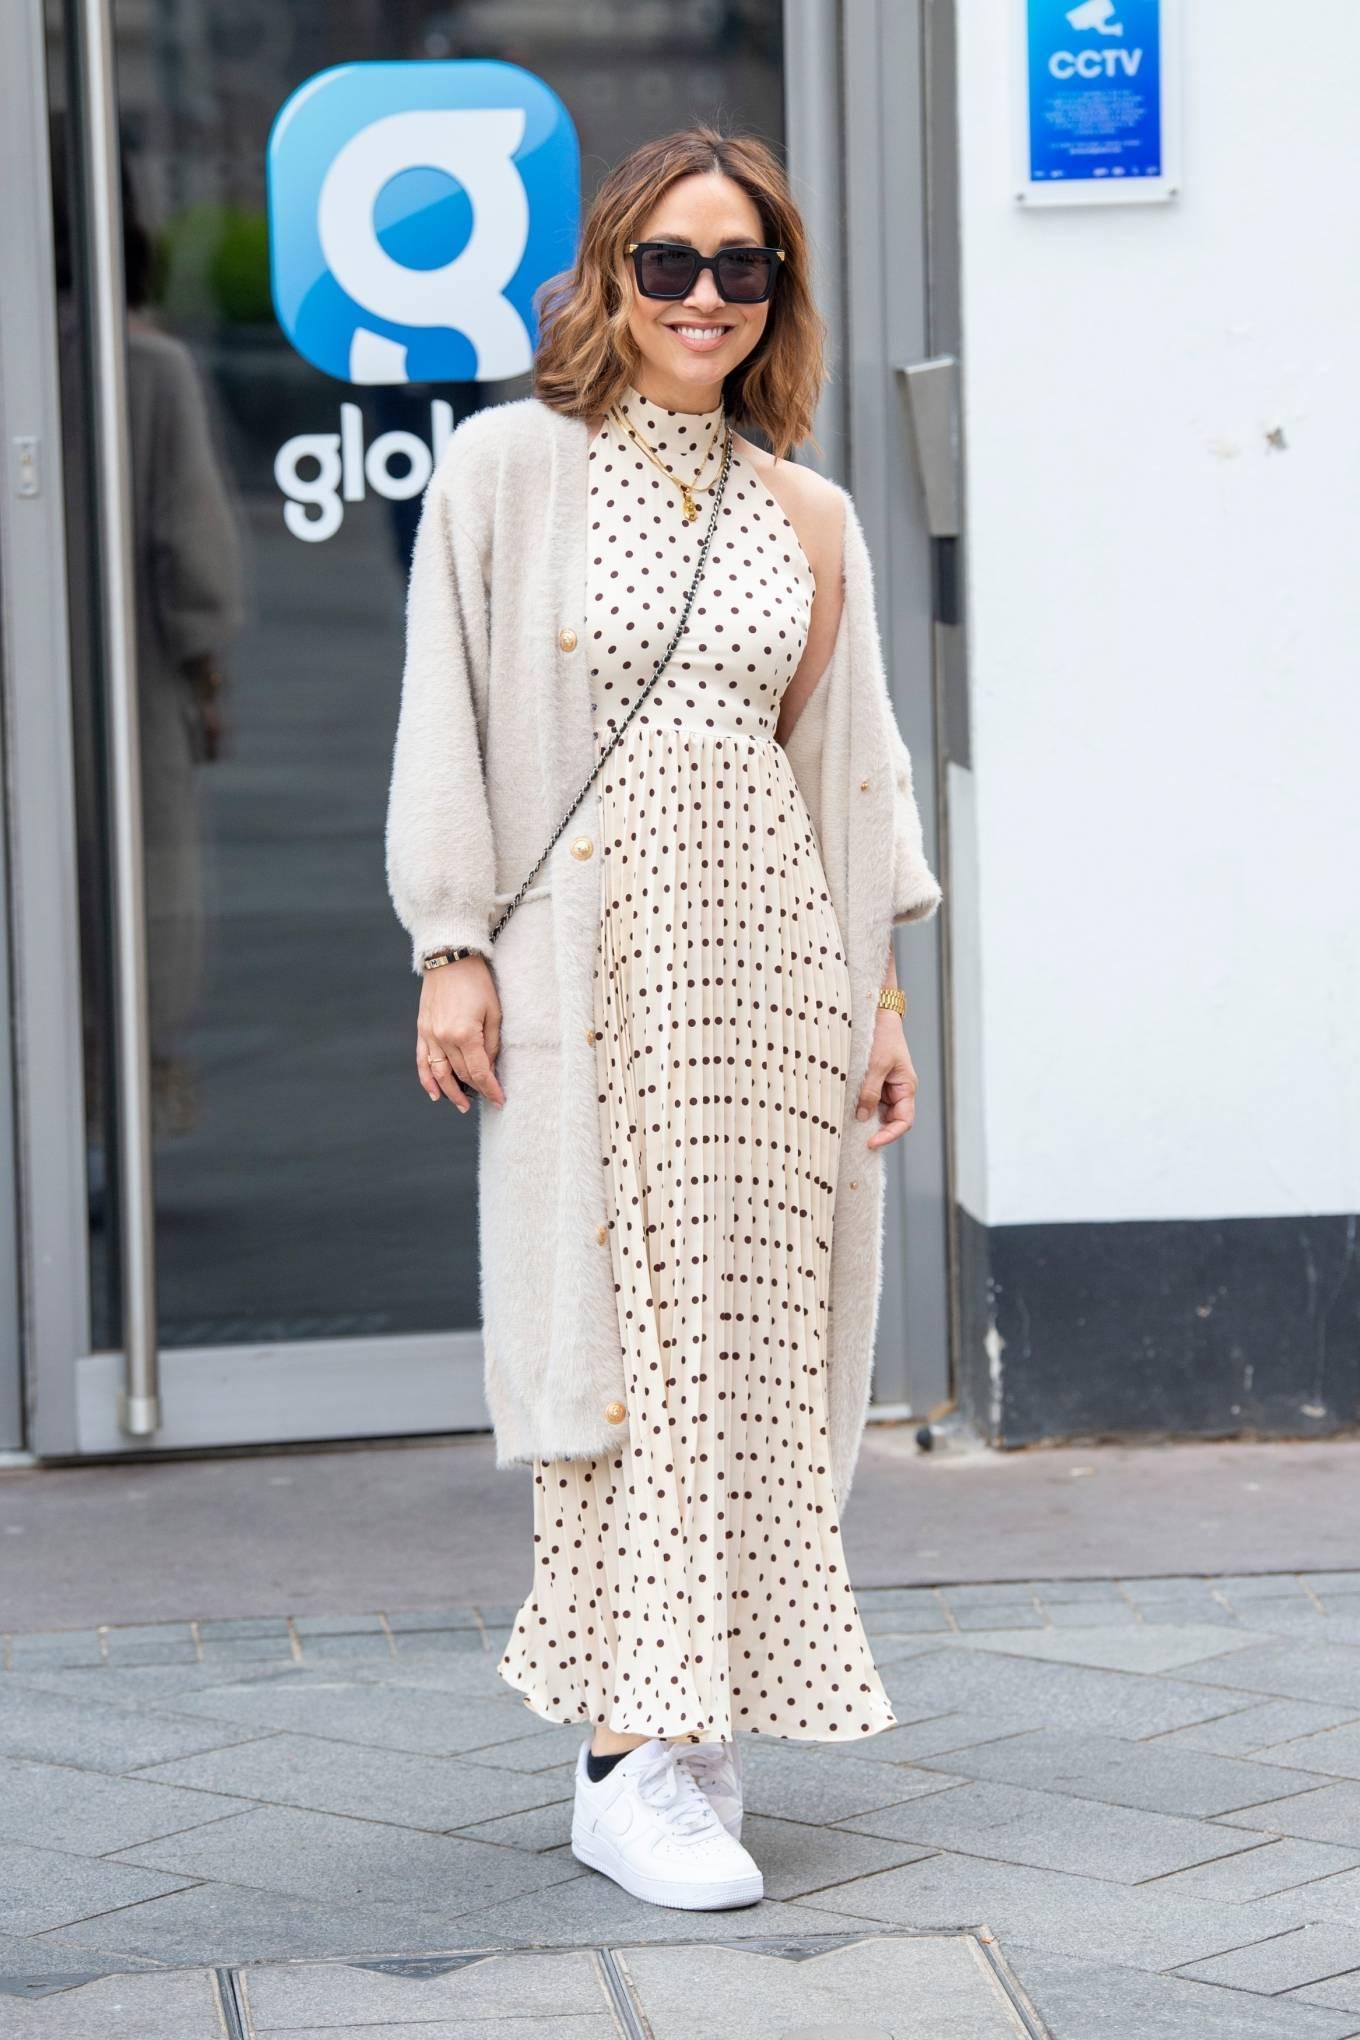 Myleene Klass - In polka dot dress arriving at the Global studios in London